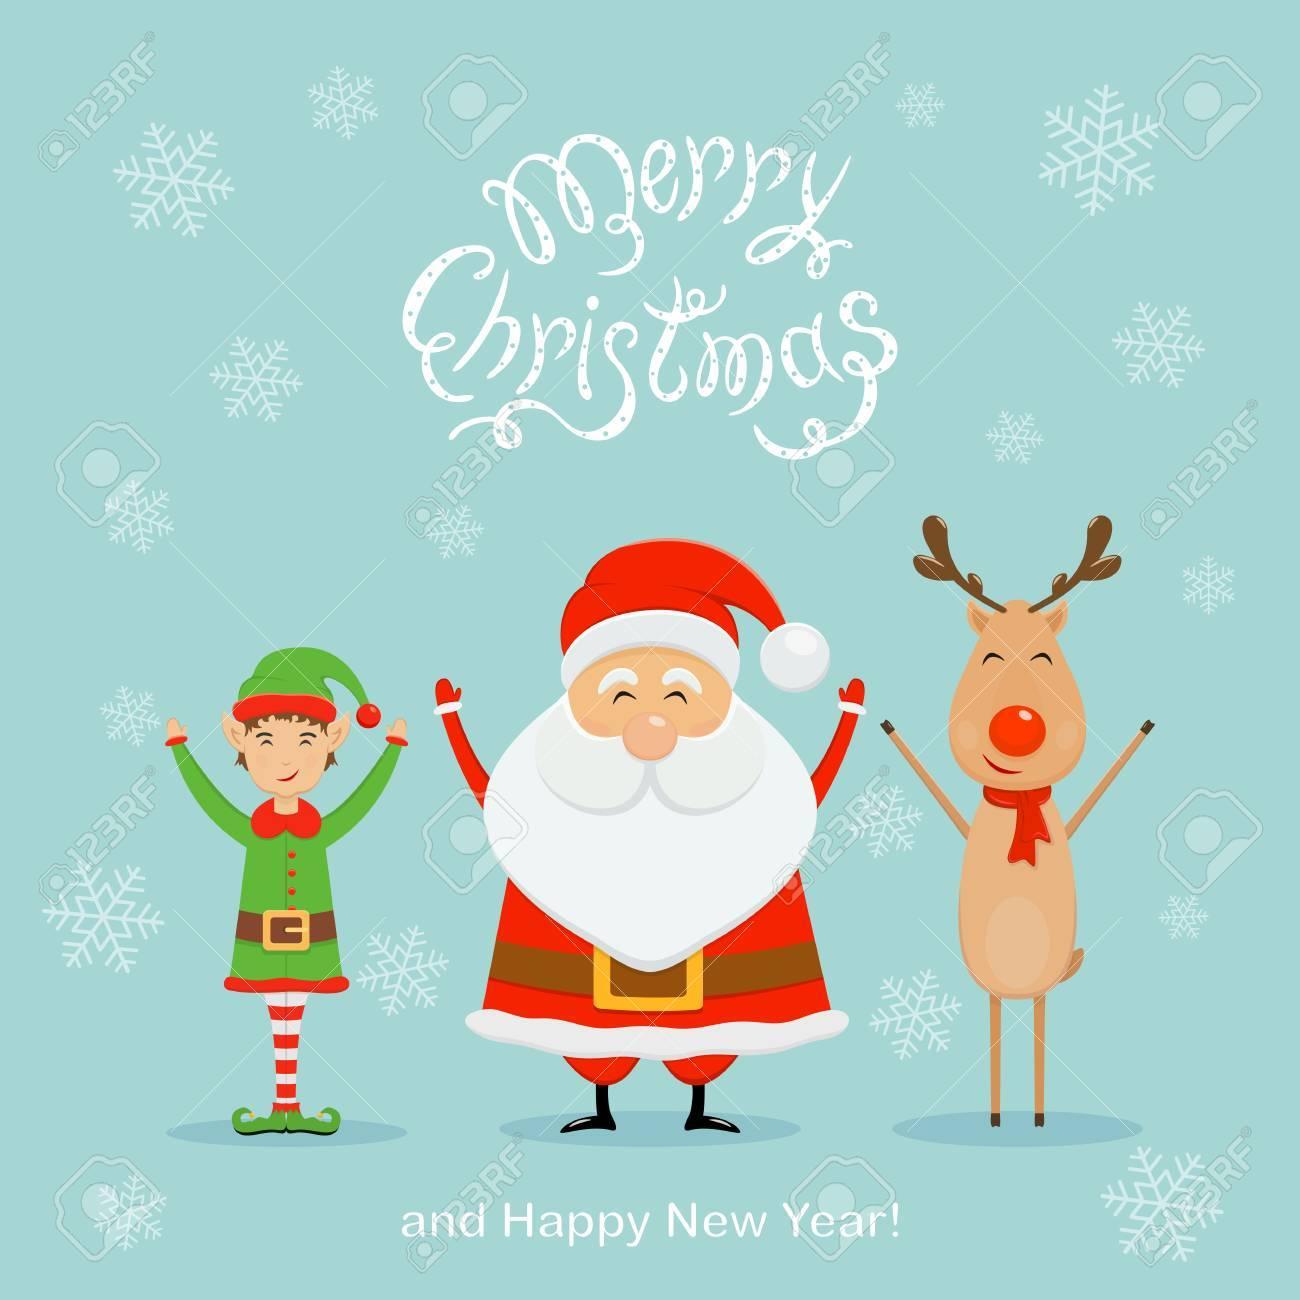 christmas greeting card design concept. - 89420570